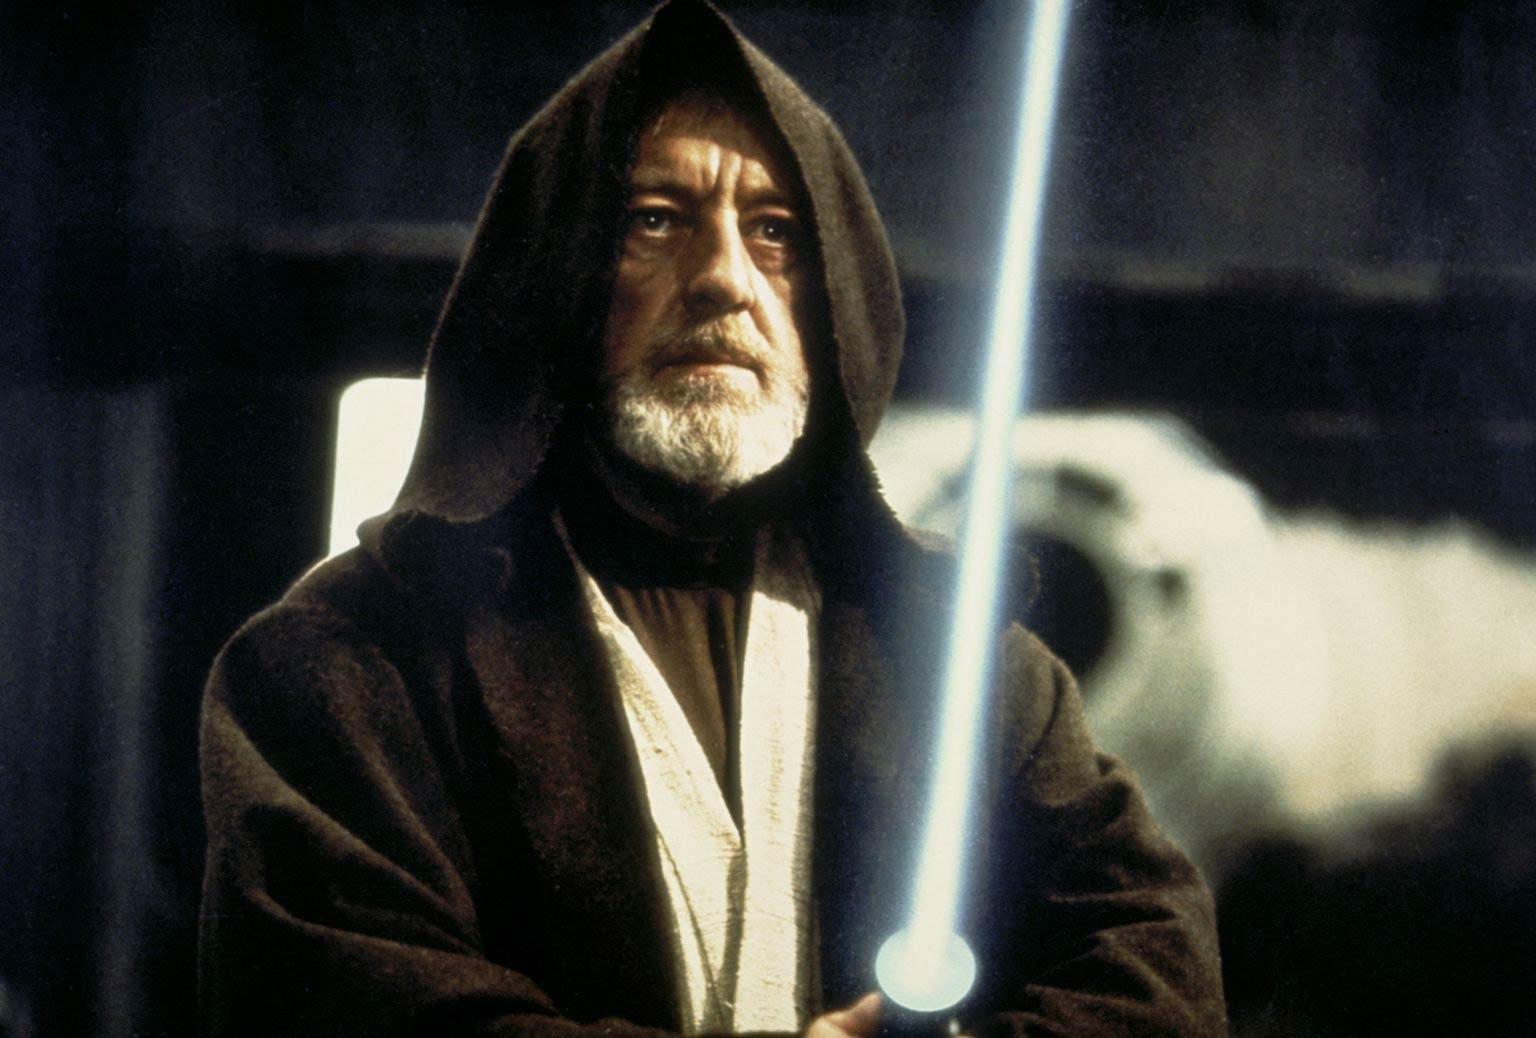 1978: Star Wars